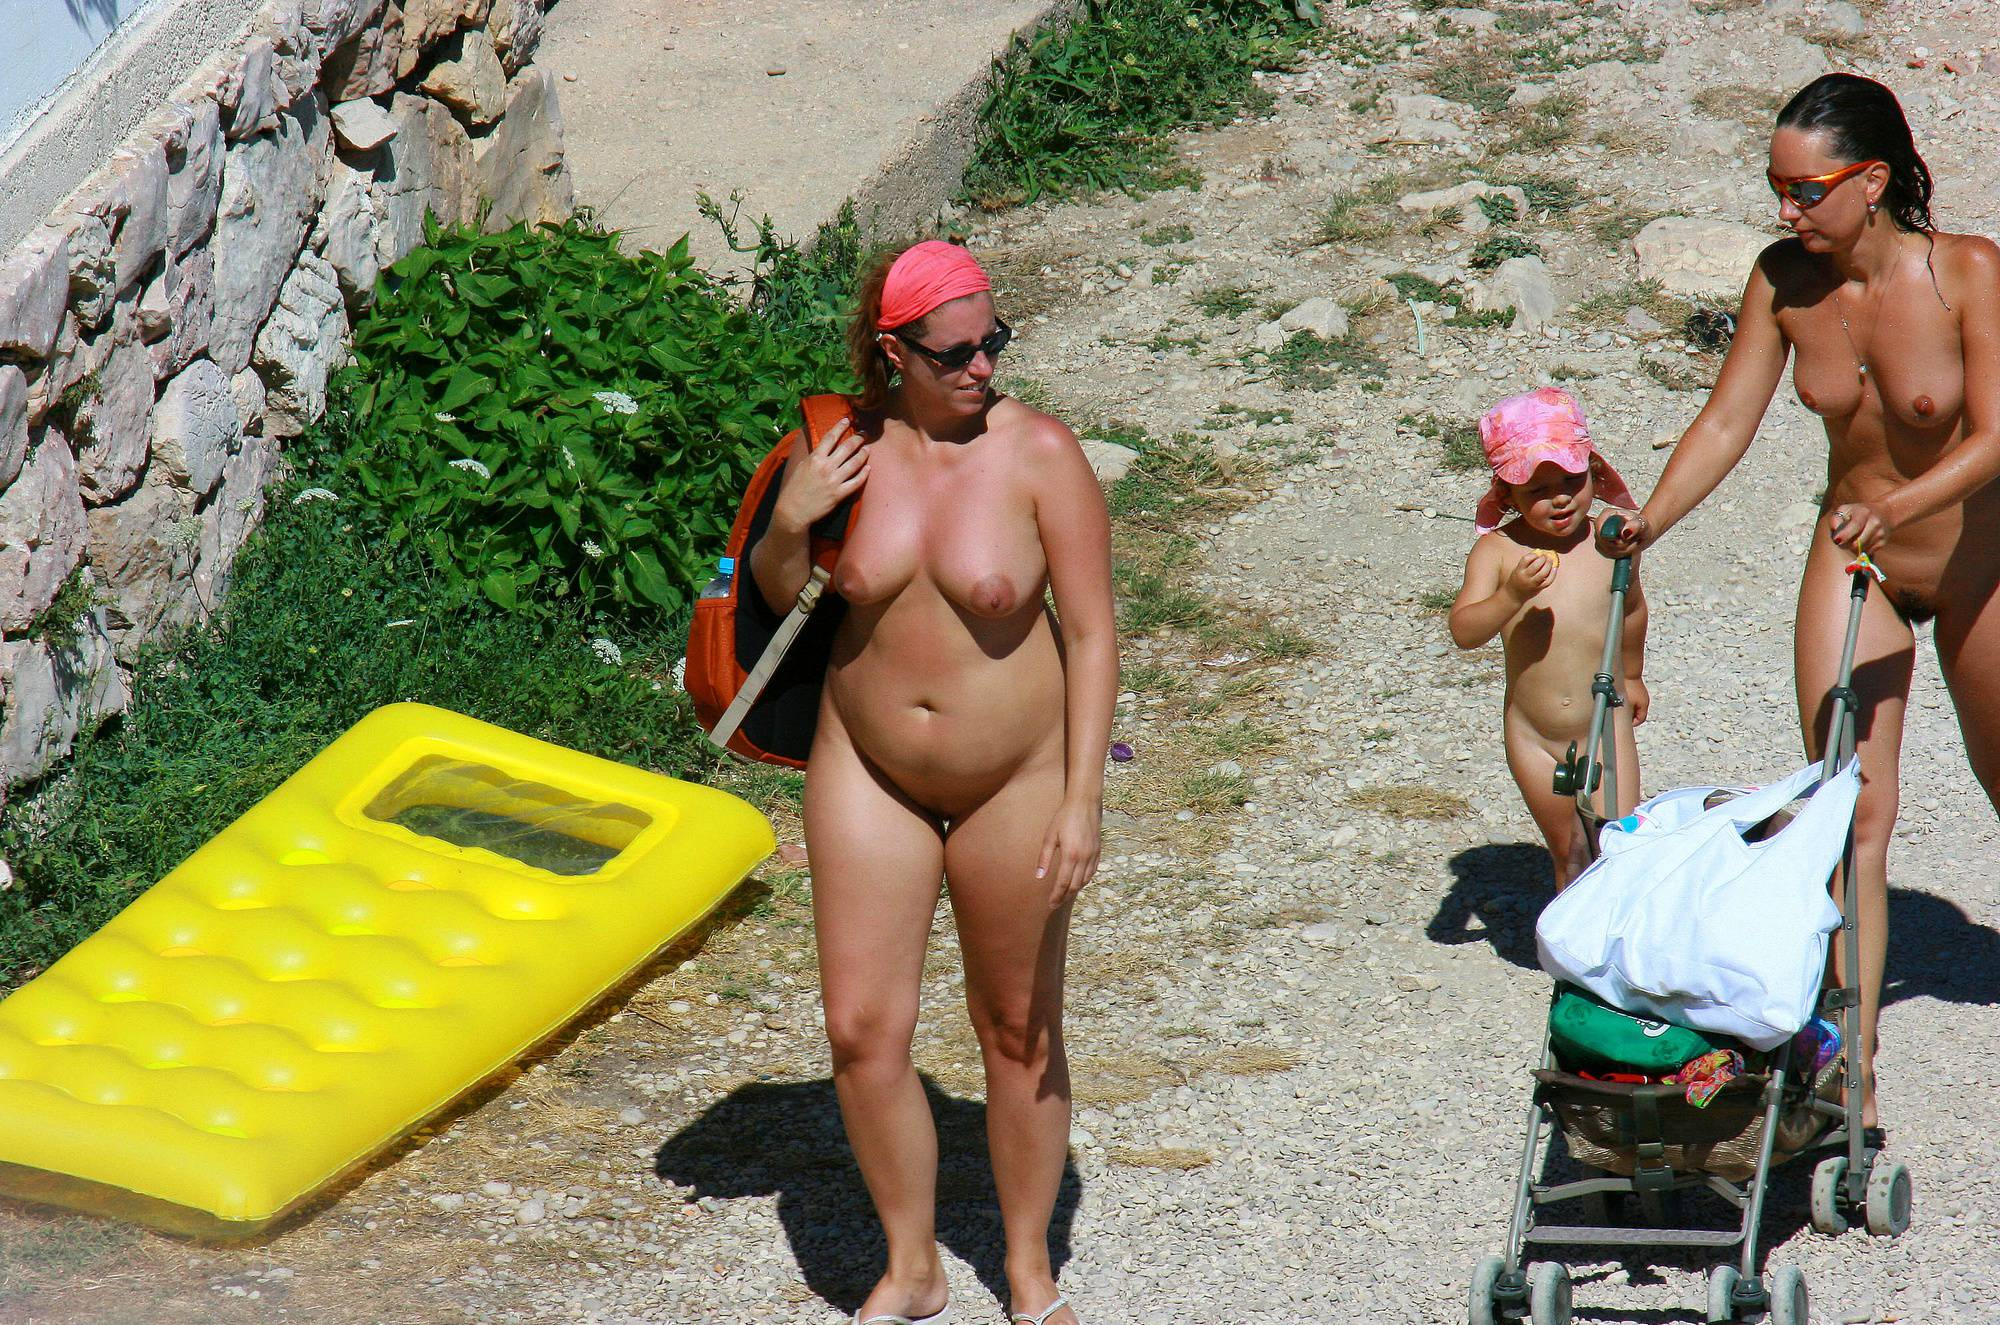 Nudist Gallery Uka FKK Beach Parenting - 1